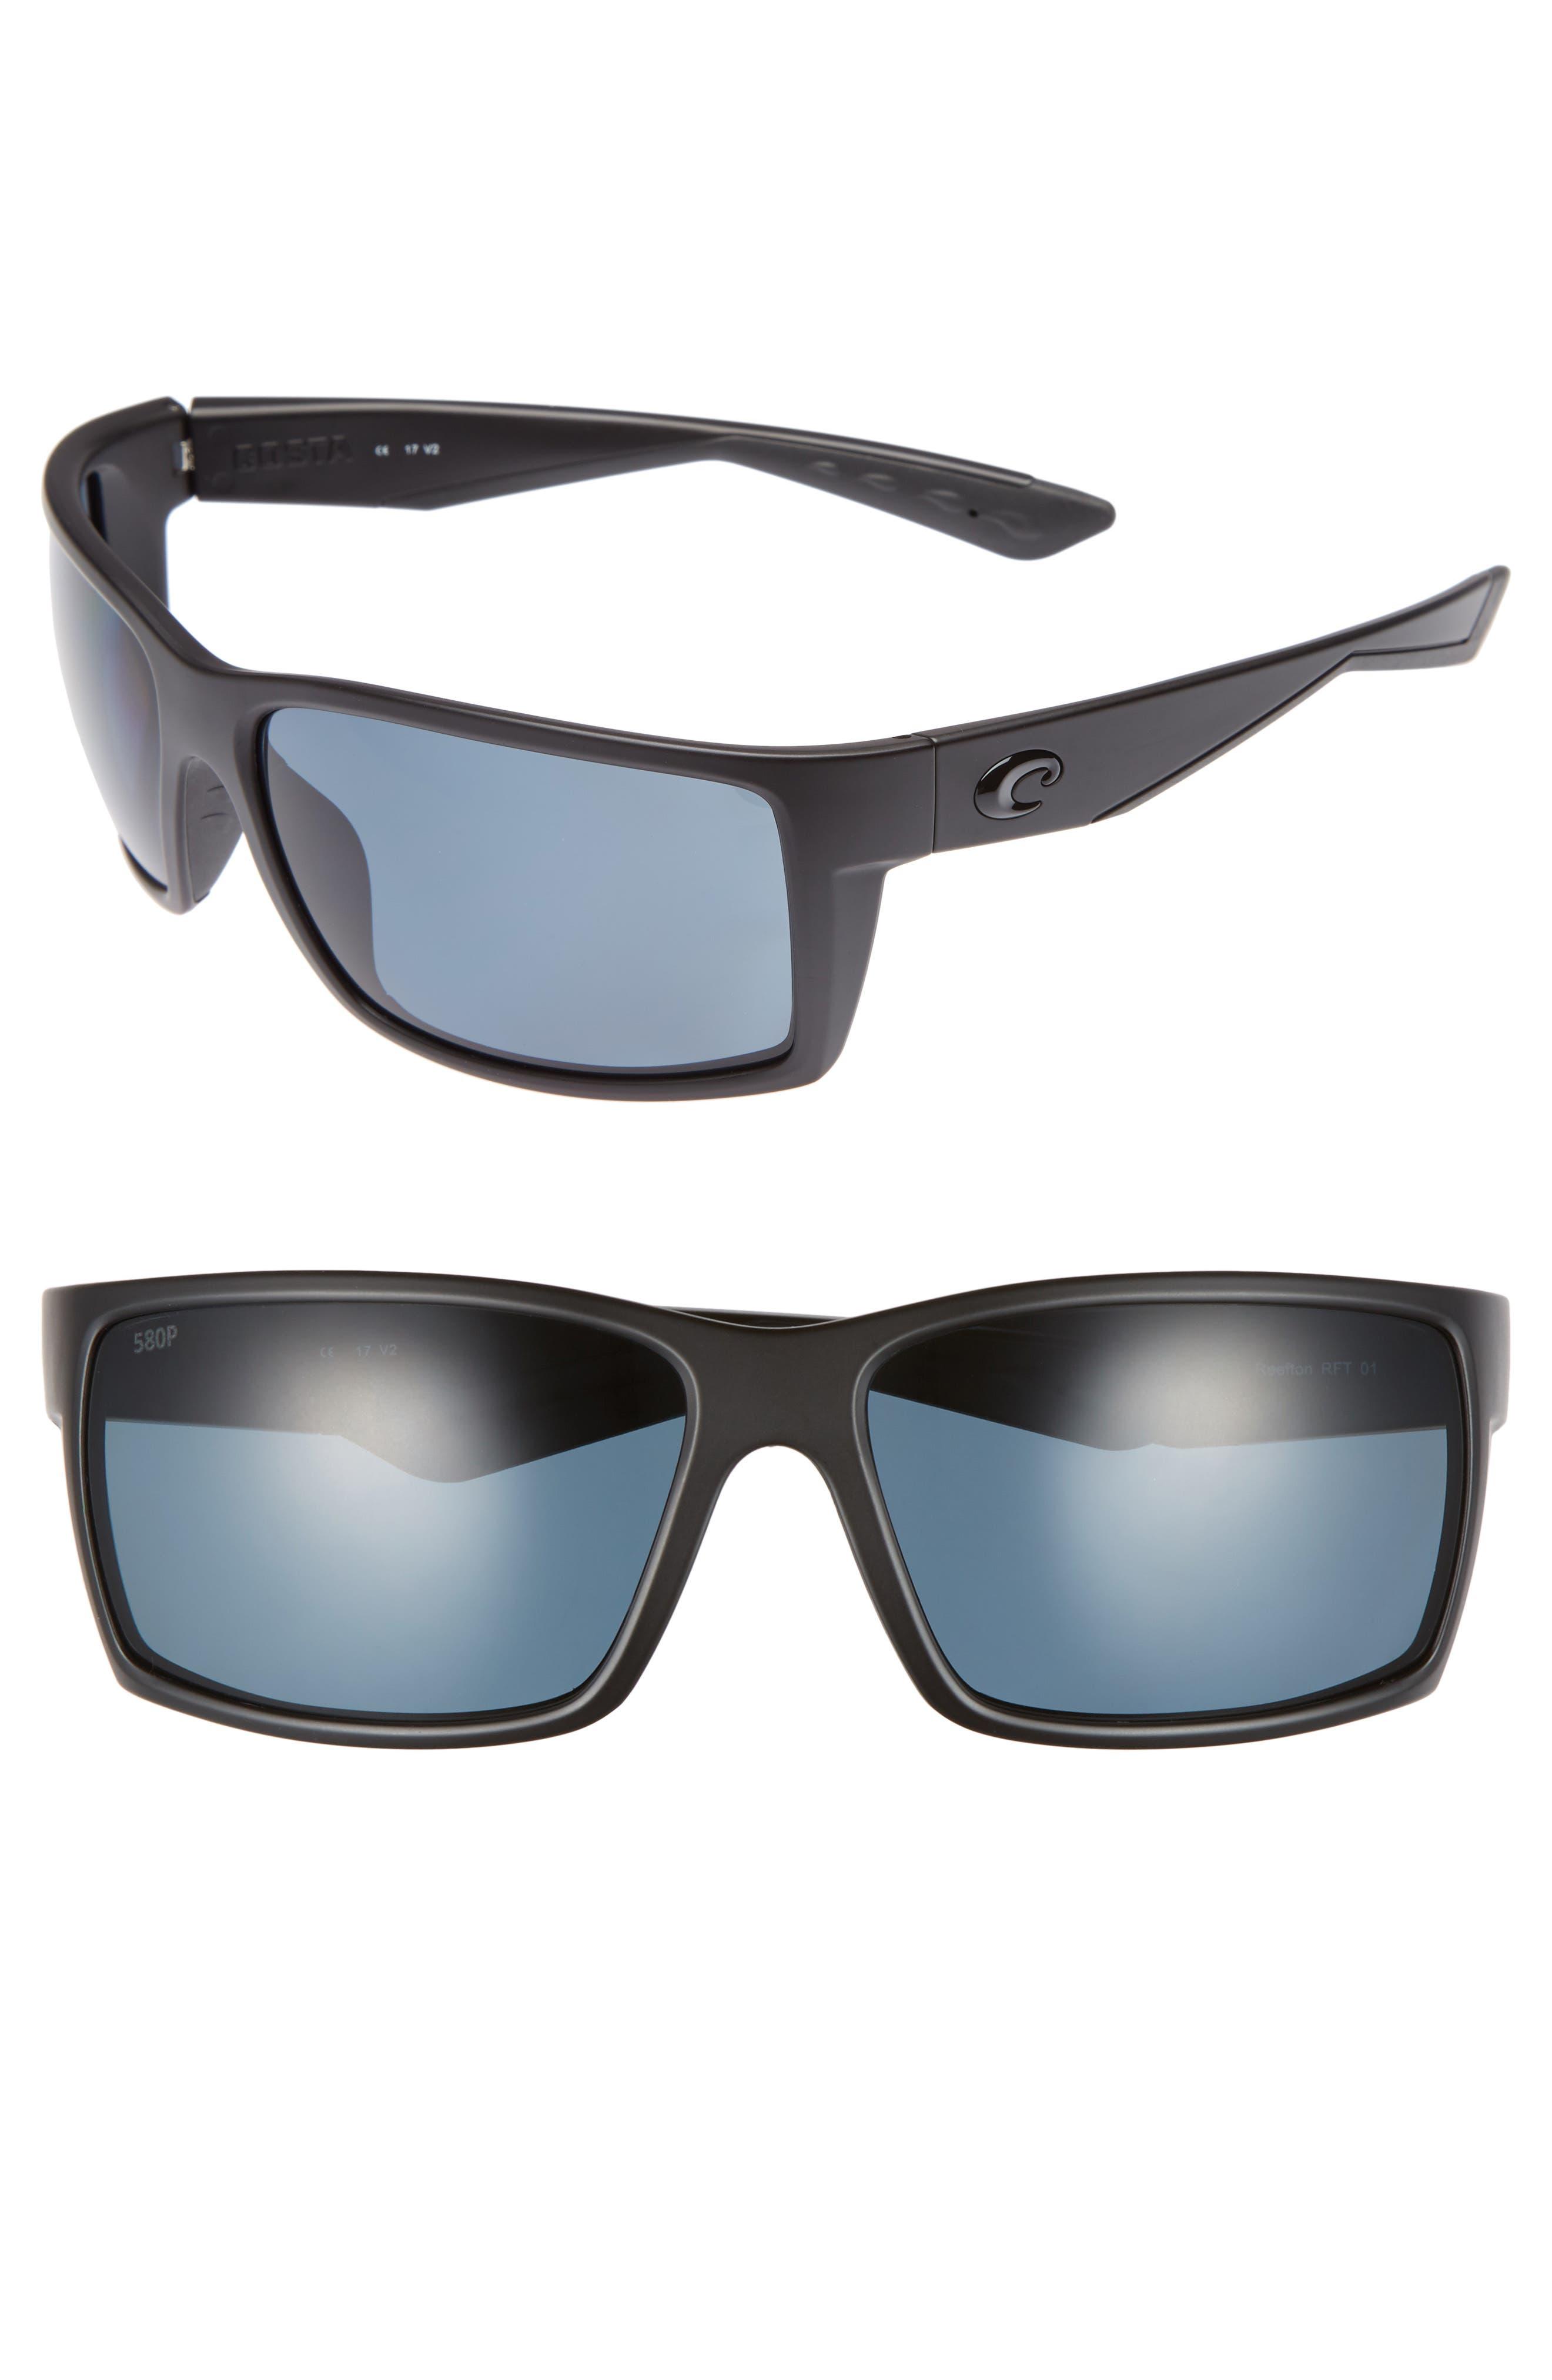 Reefton 65mm Polarized Sunglasses,                             Main thumbnail 1, color,                             001